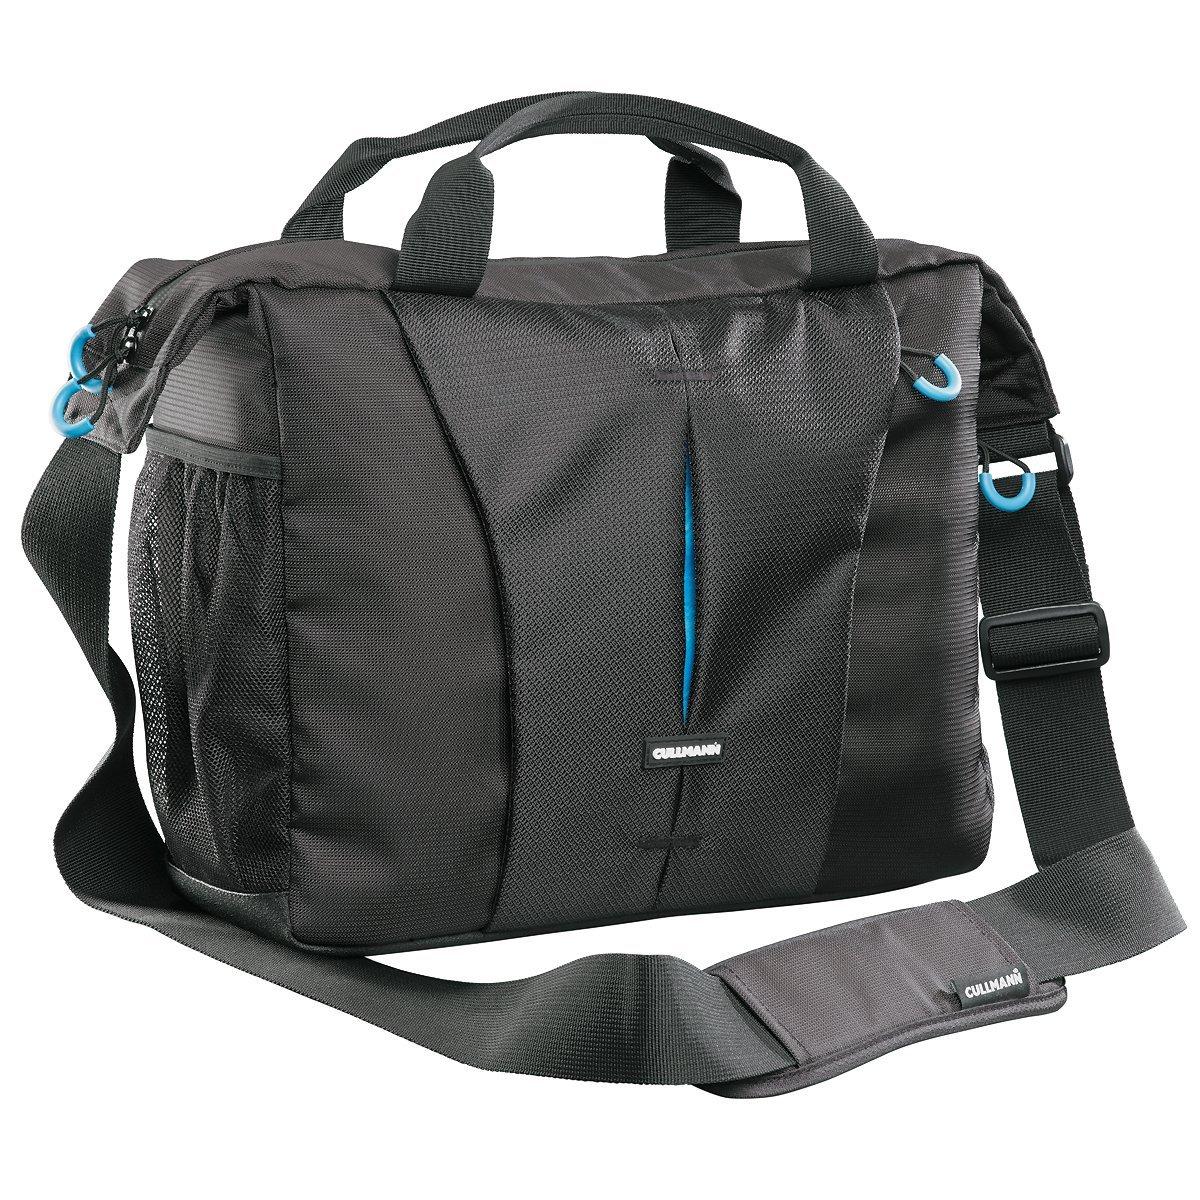 Cullmann Sydney Pro Maxima 425+ Camera Bag - £33 (free C+C) @ Park Cameras